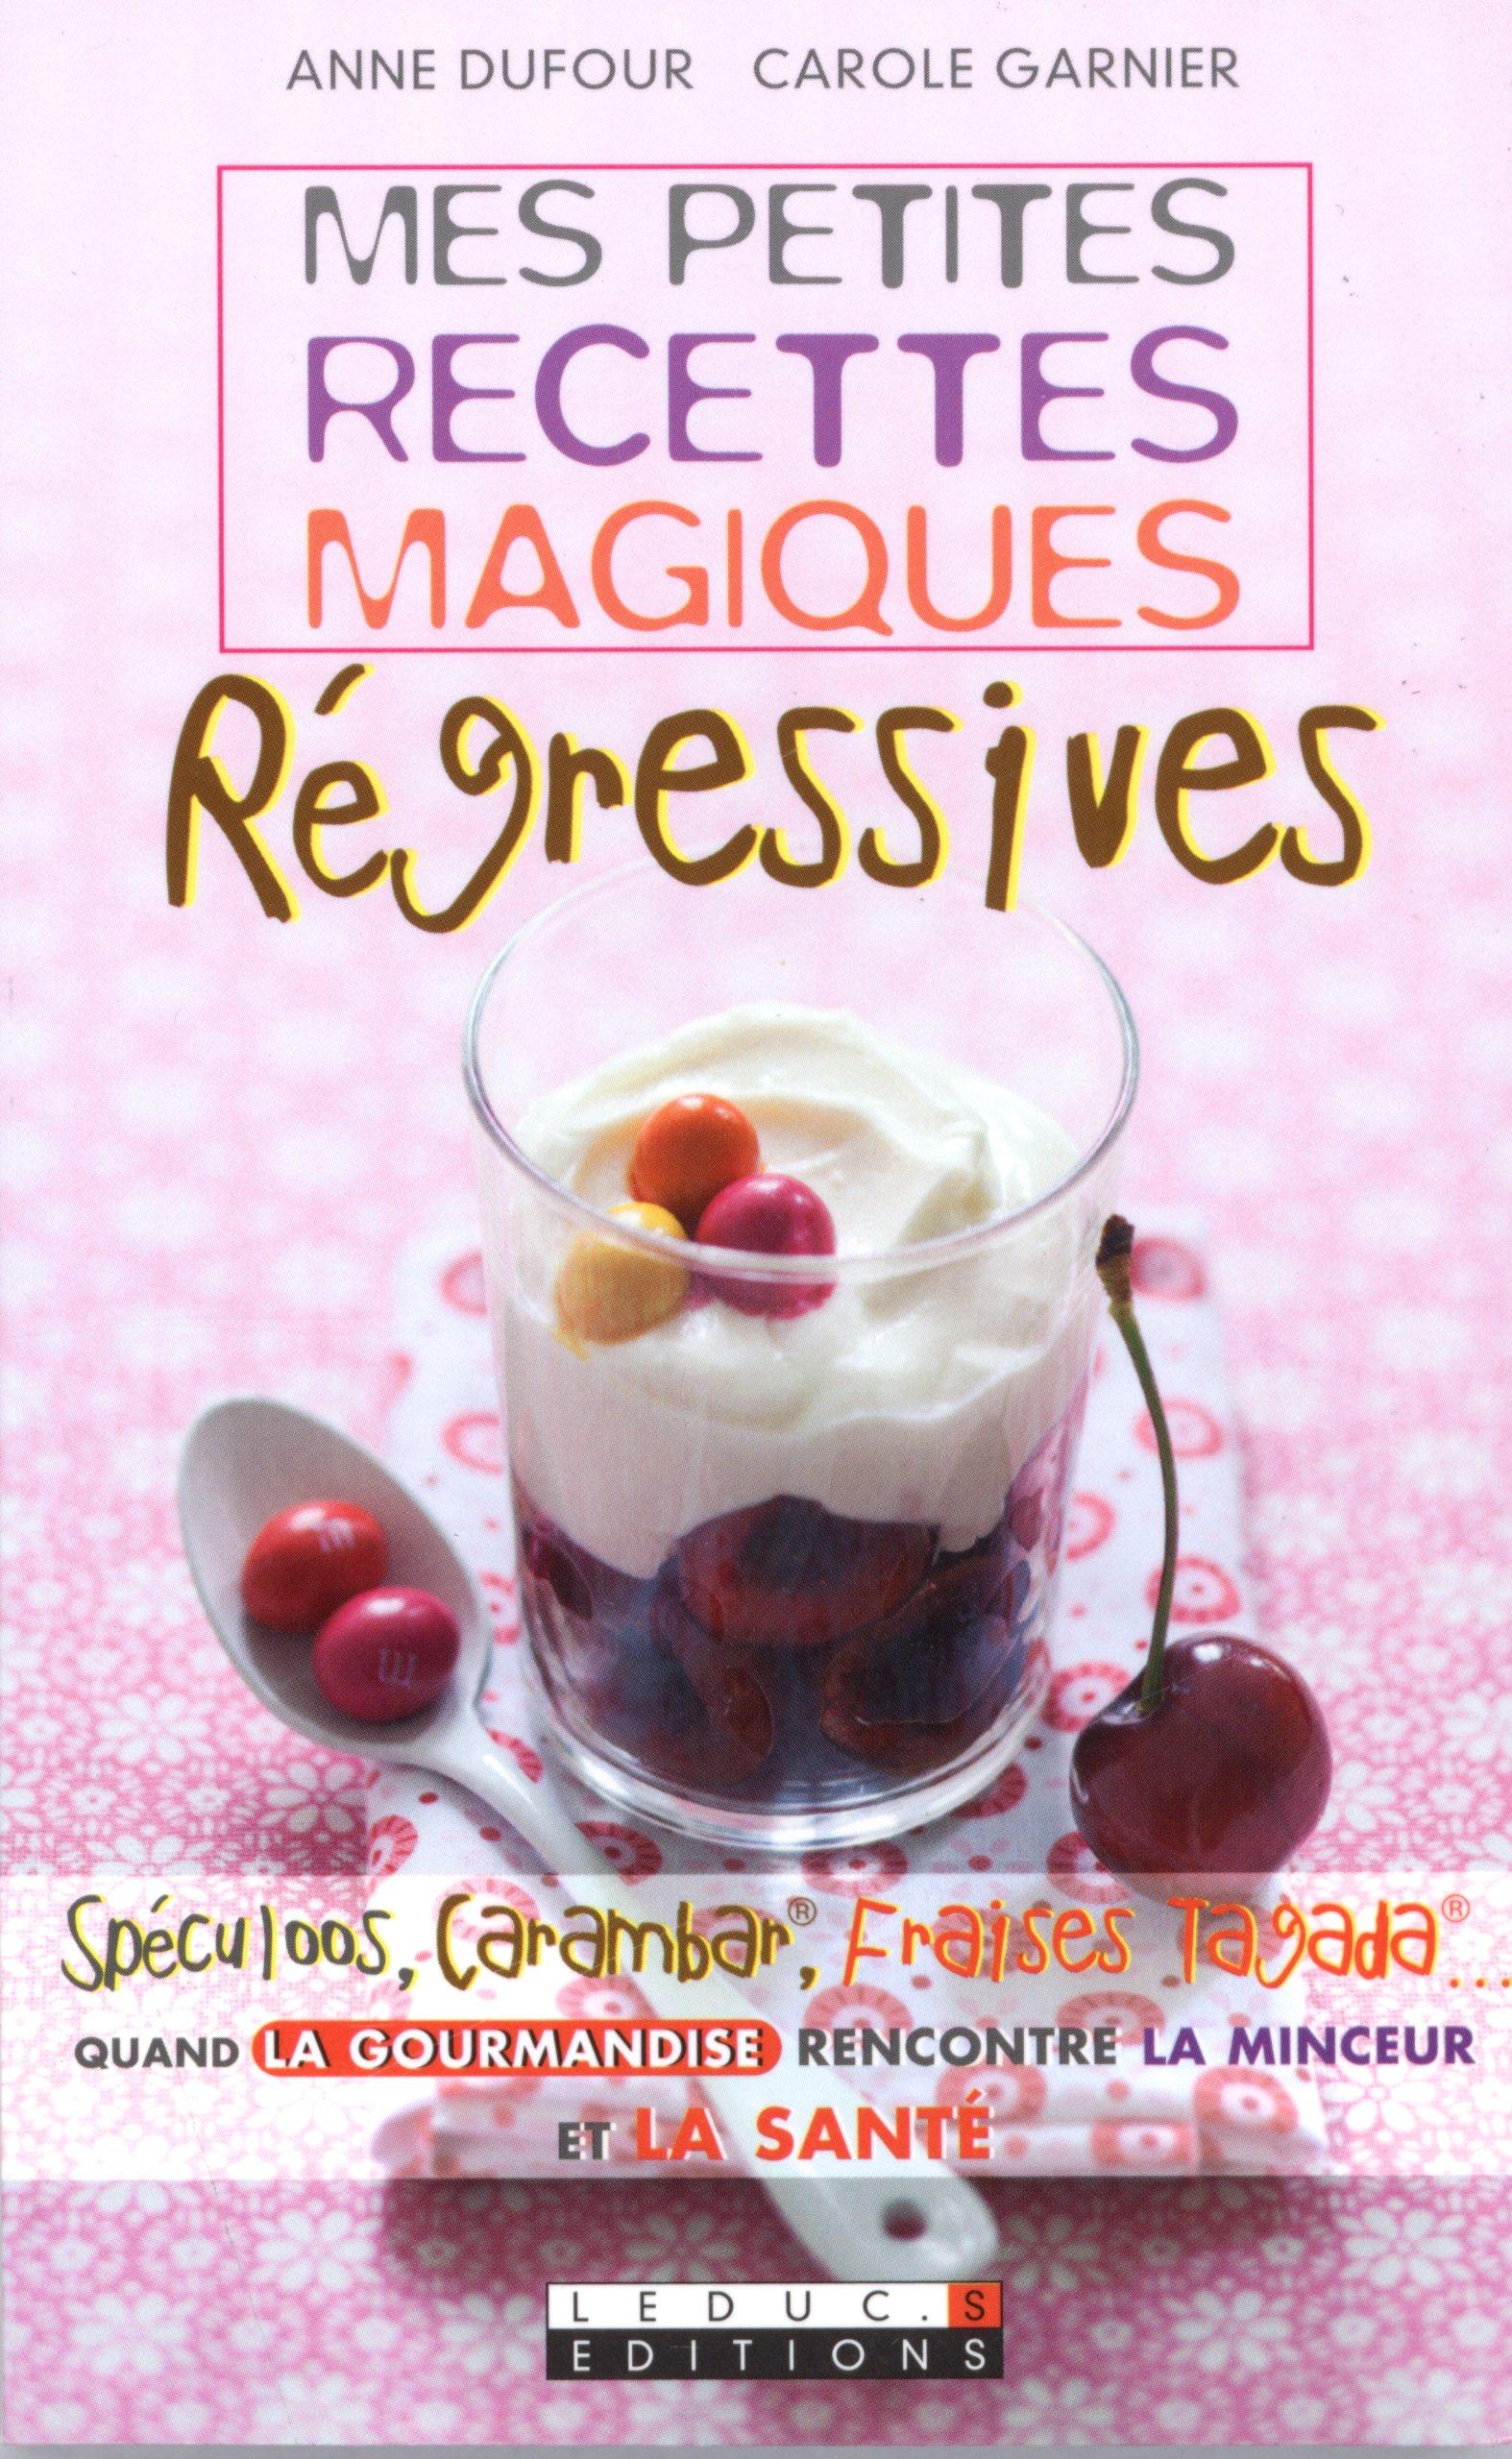 Mes petites recettes magiques régressives